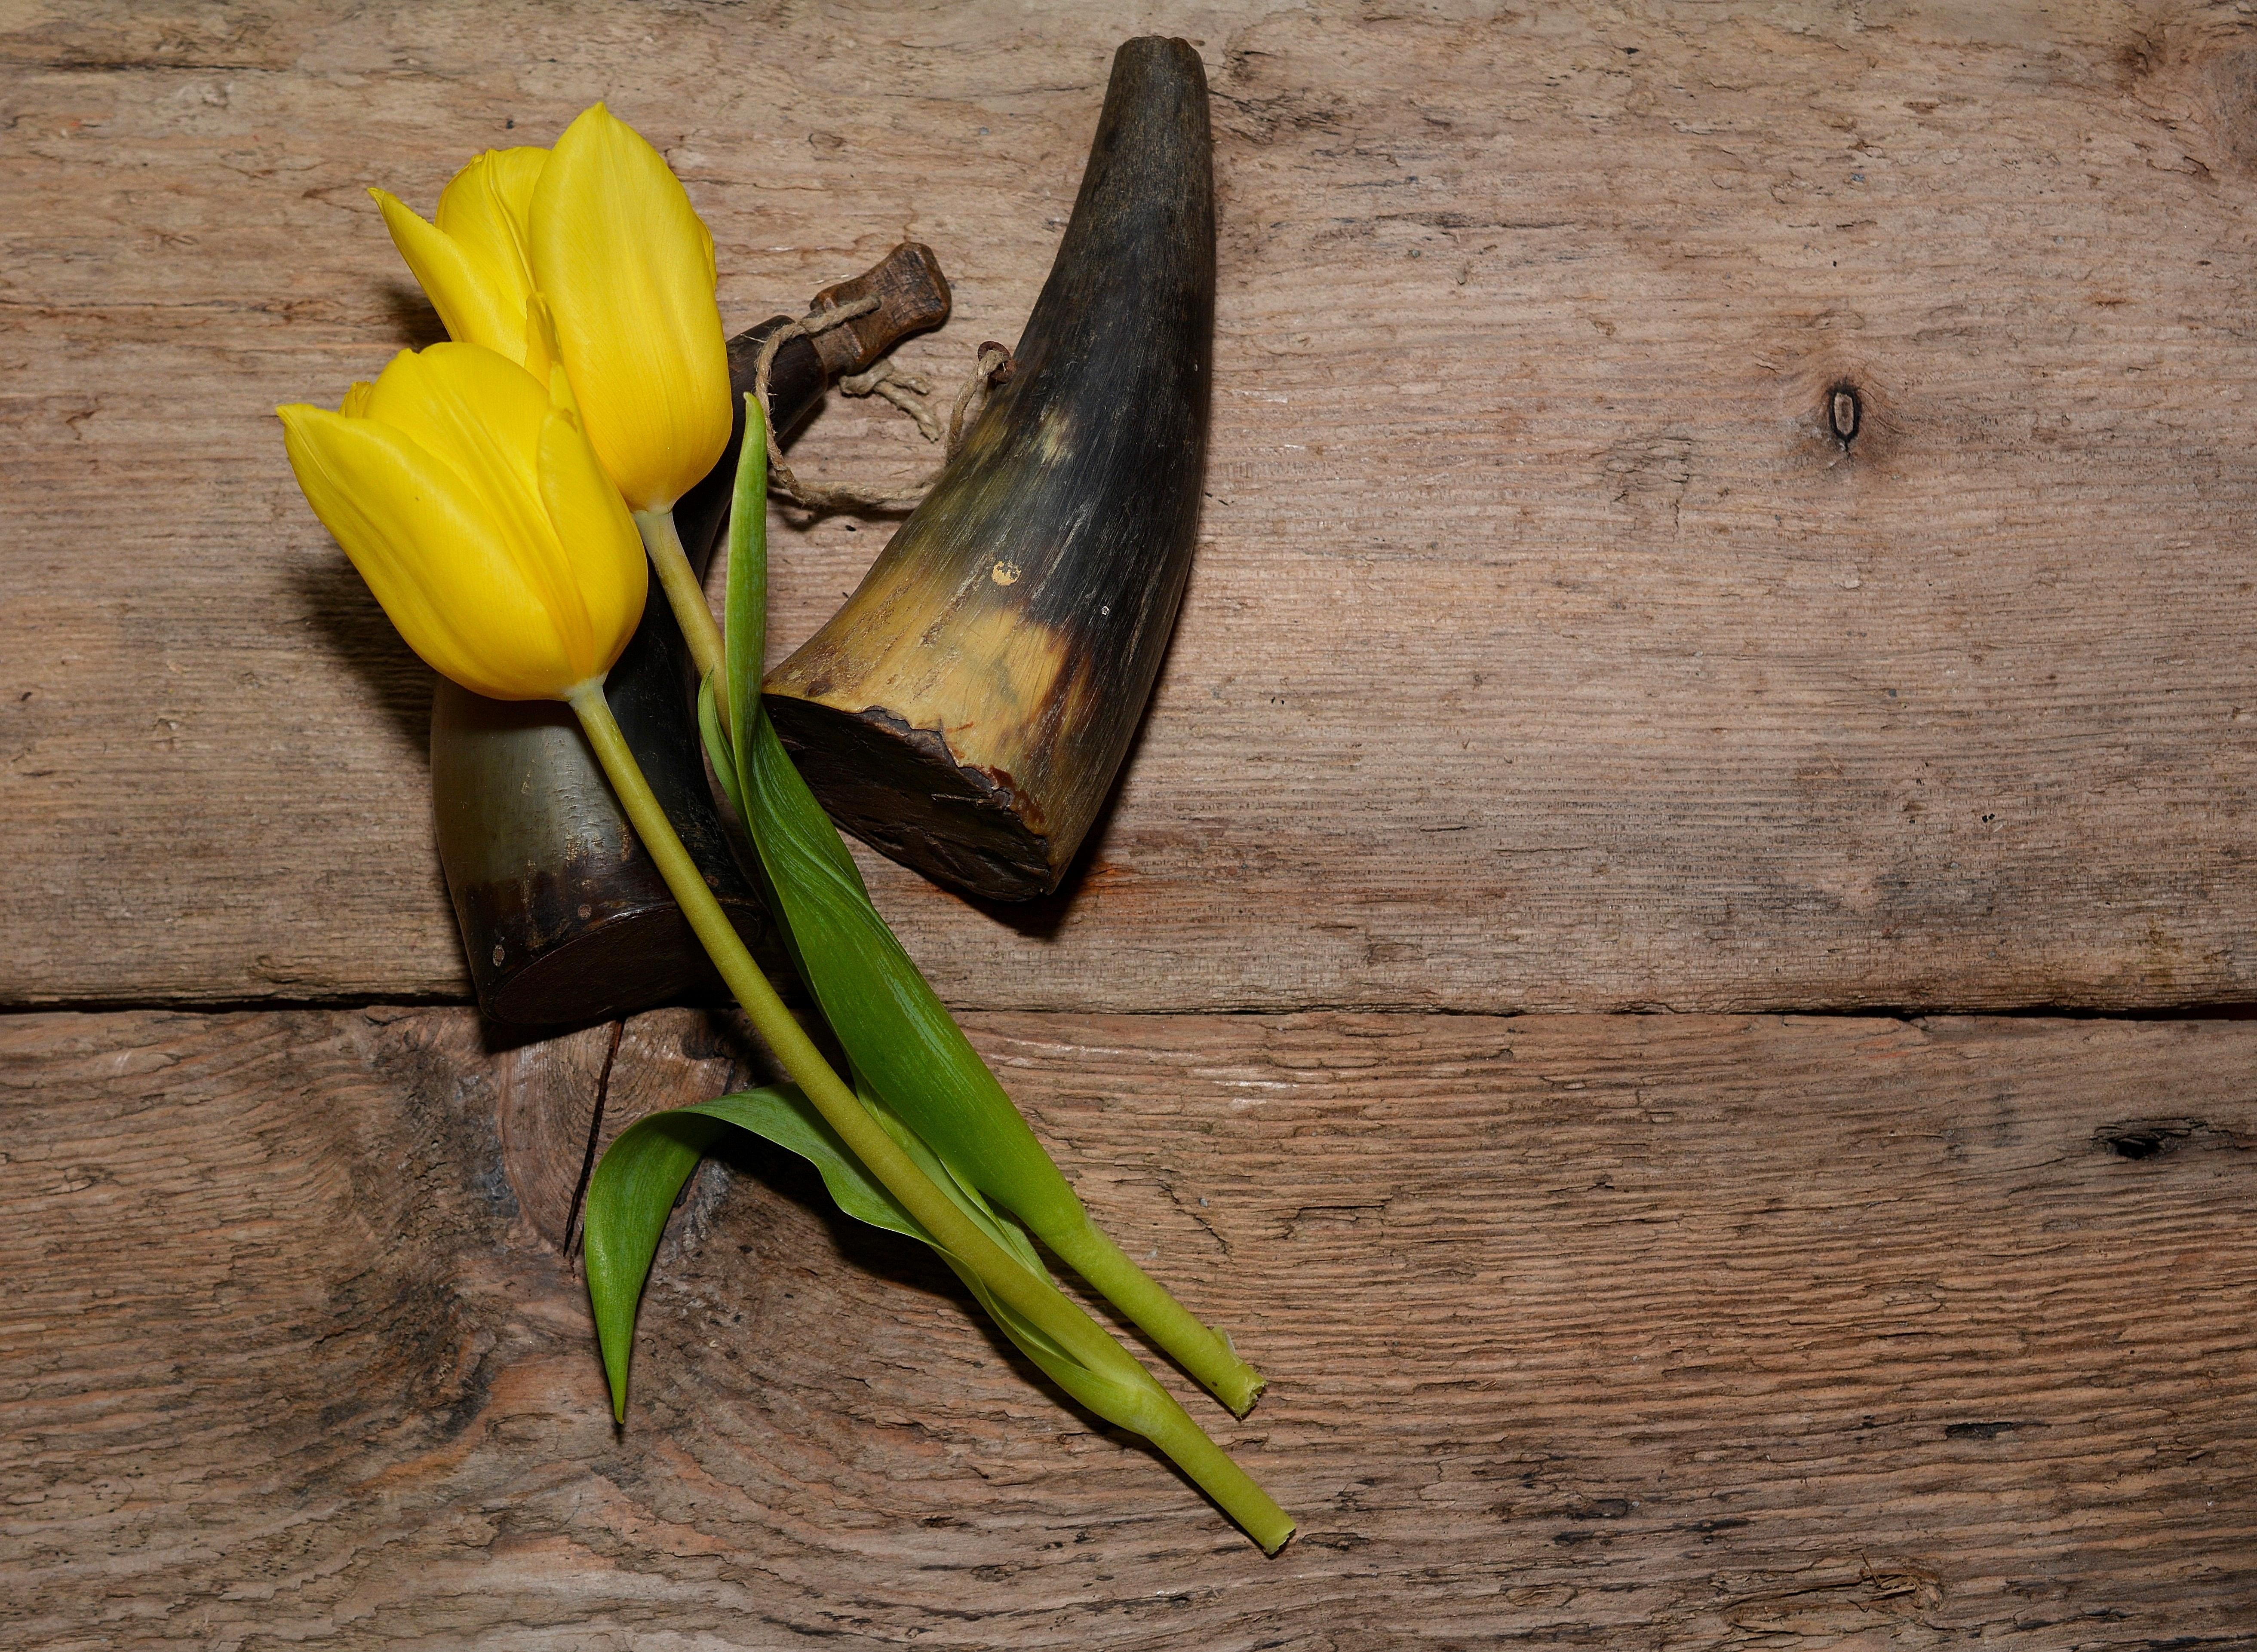 menanam kayu antik daun bunga hijau menghasilkan serangga botani kuning Flora bunga bunga merapatkan tulip